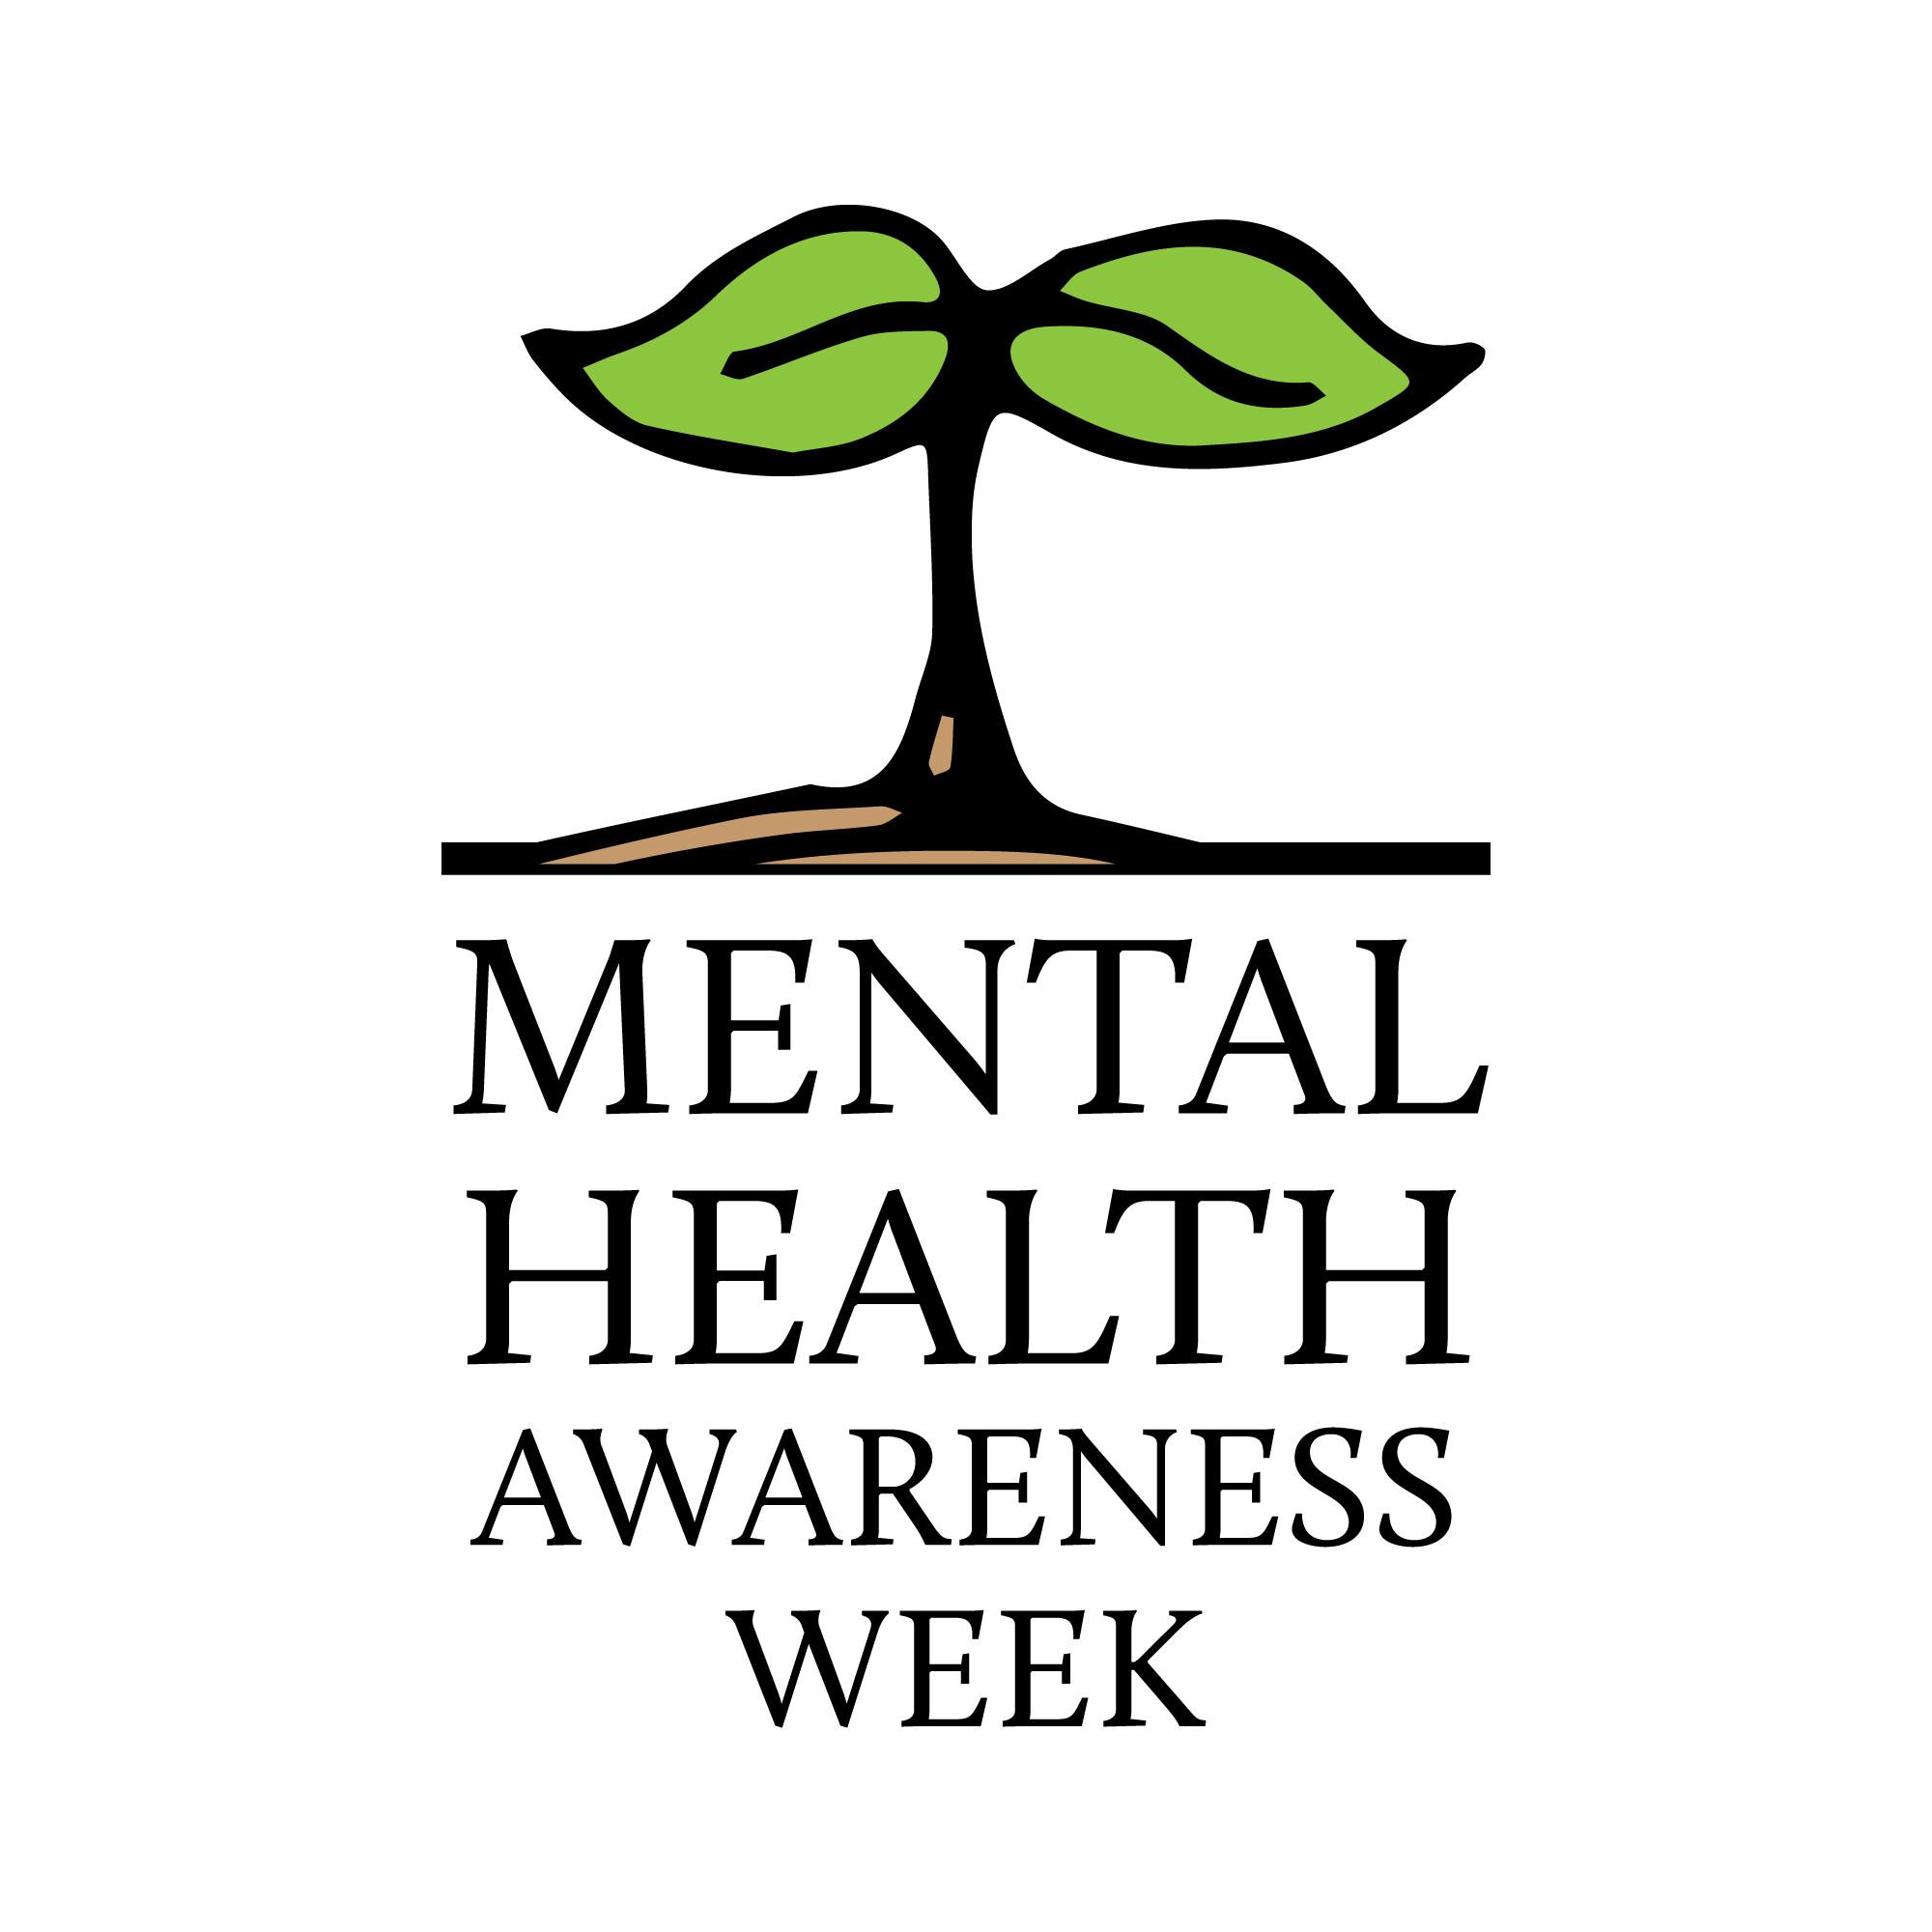 mental health awareness week - photo #1